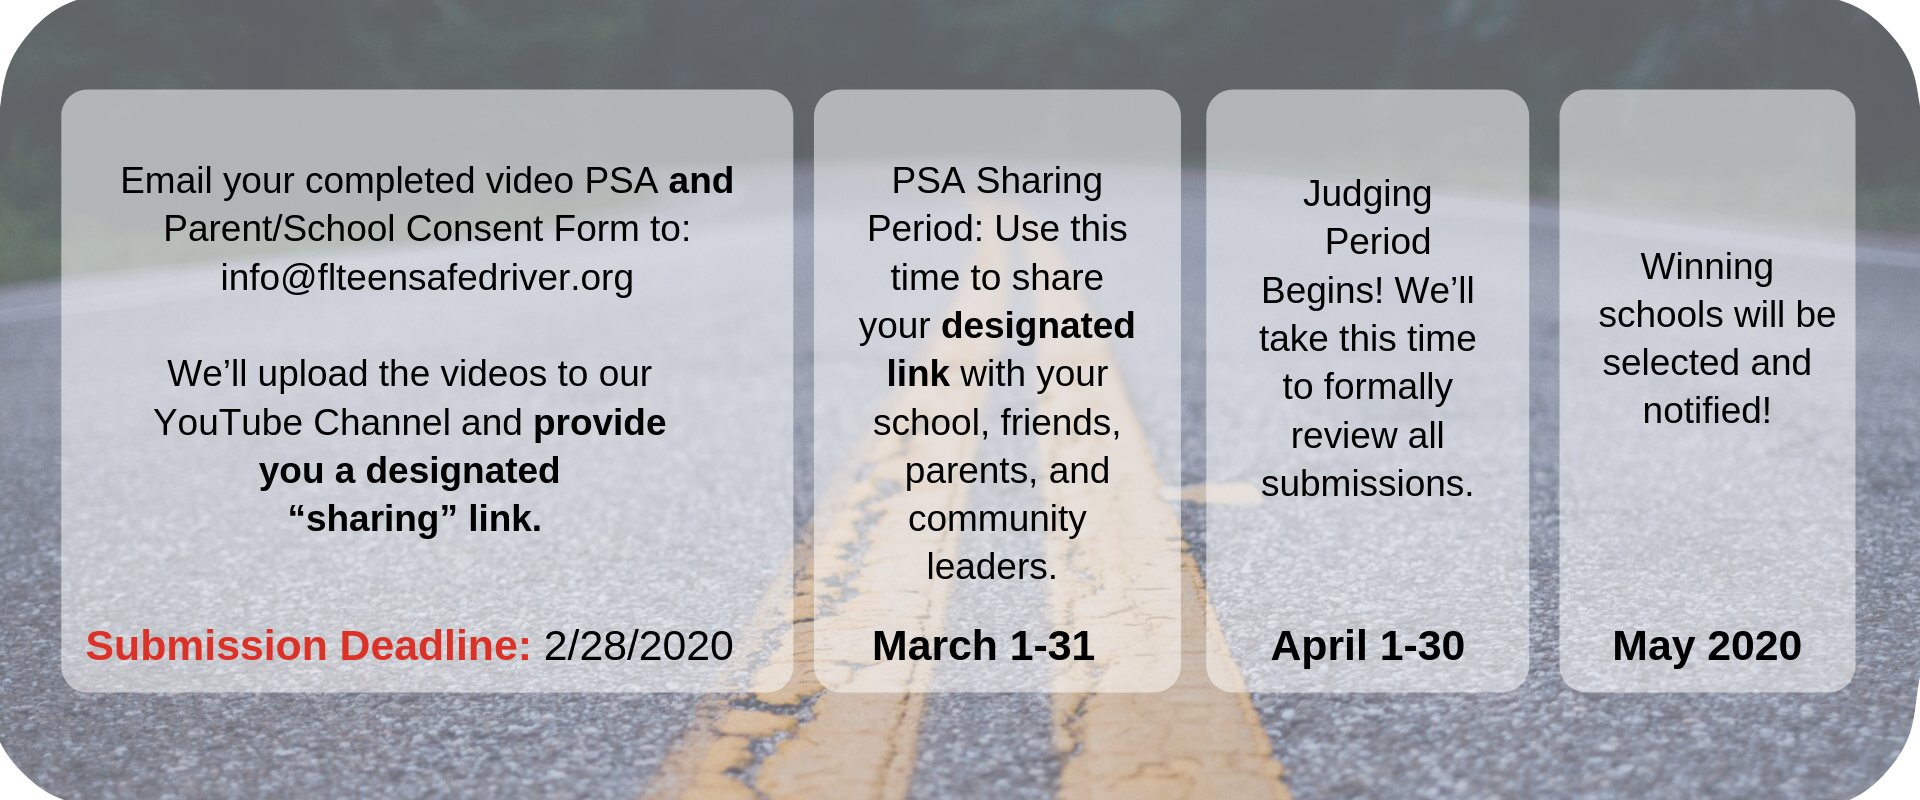 GDL PSA Contest Overview Process Image